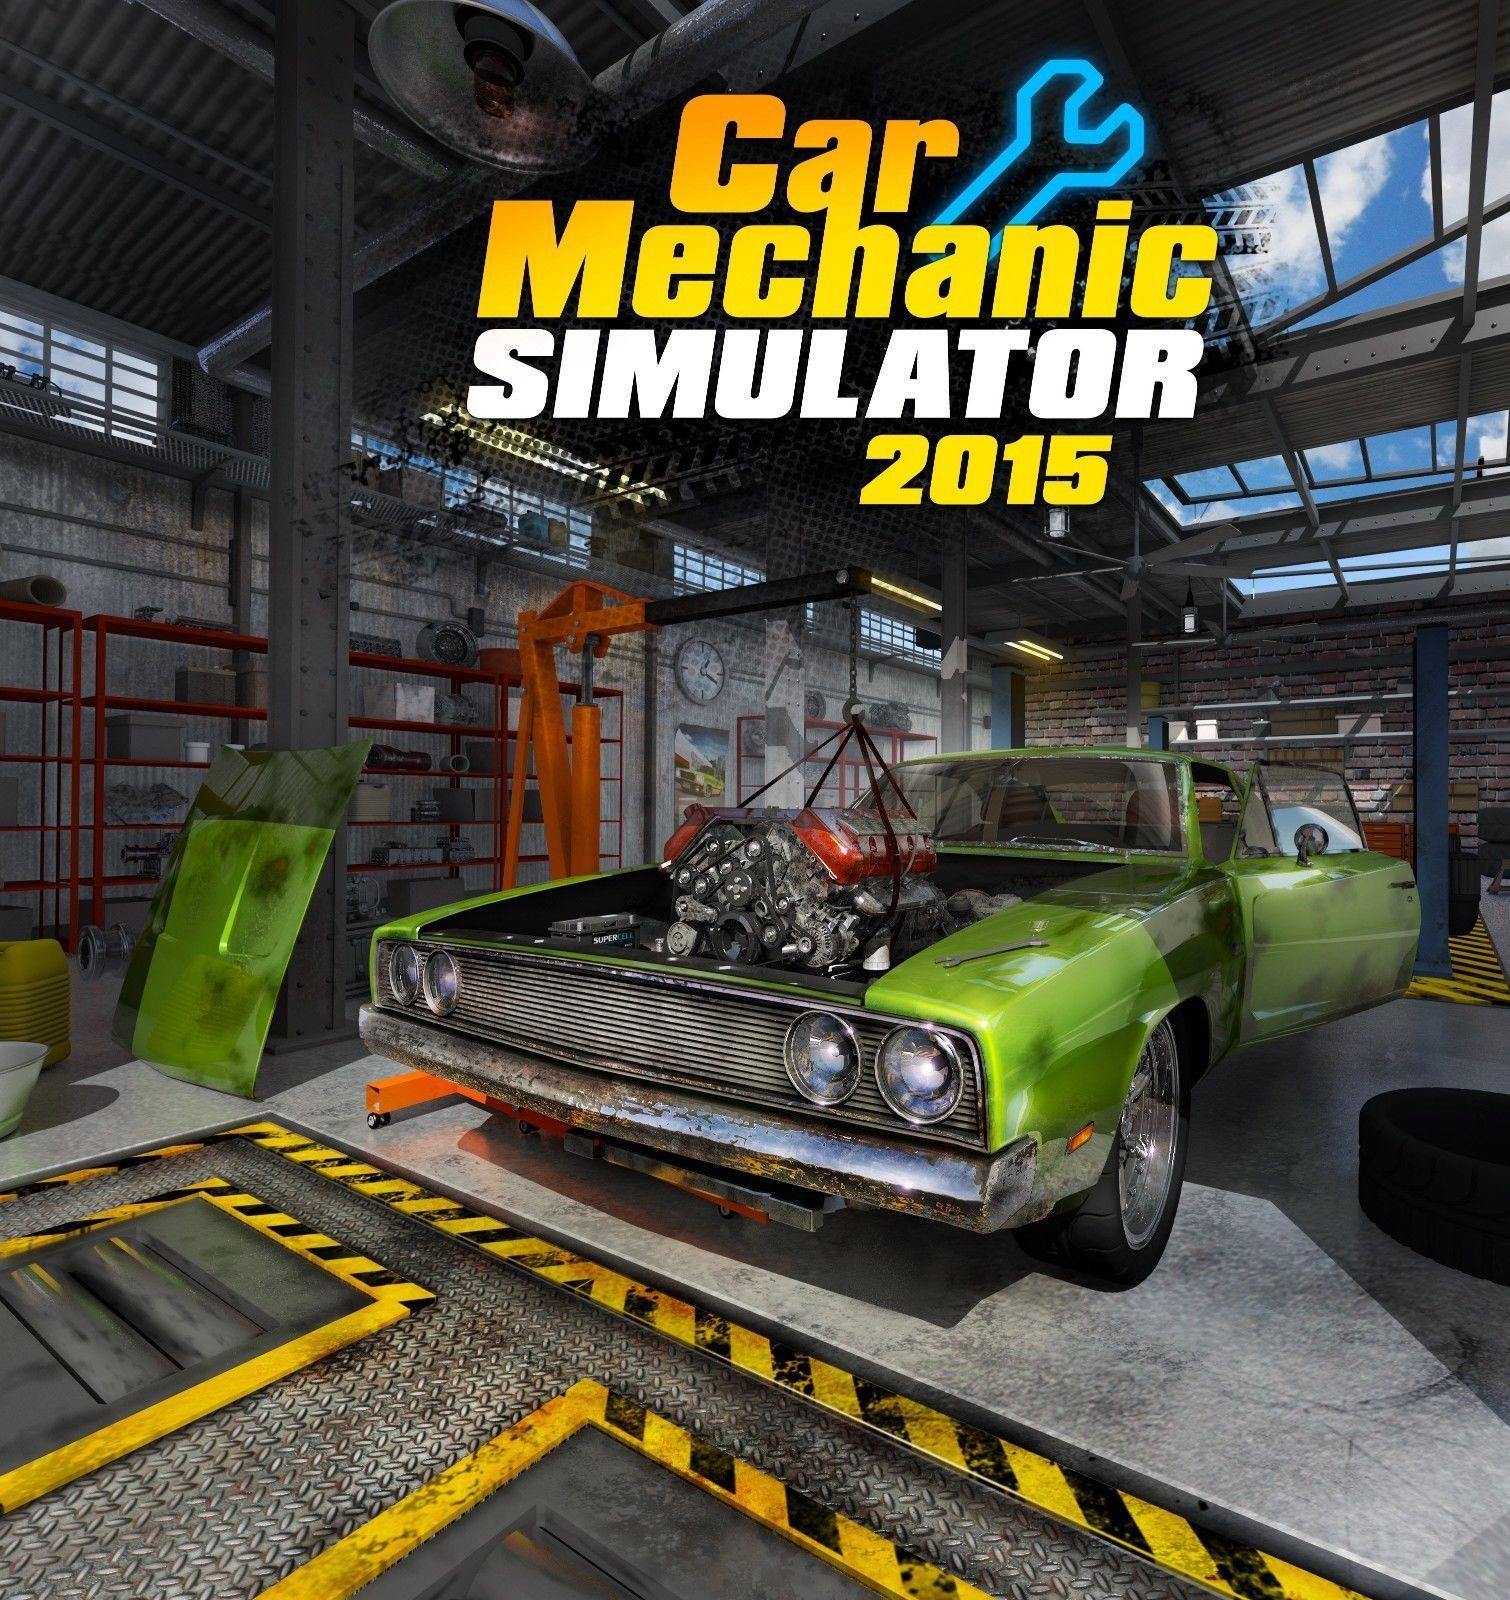 playway  Car Mechanic Simulator Bentley  on STEAM now!